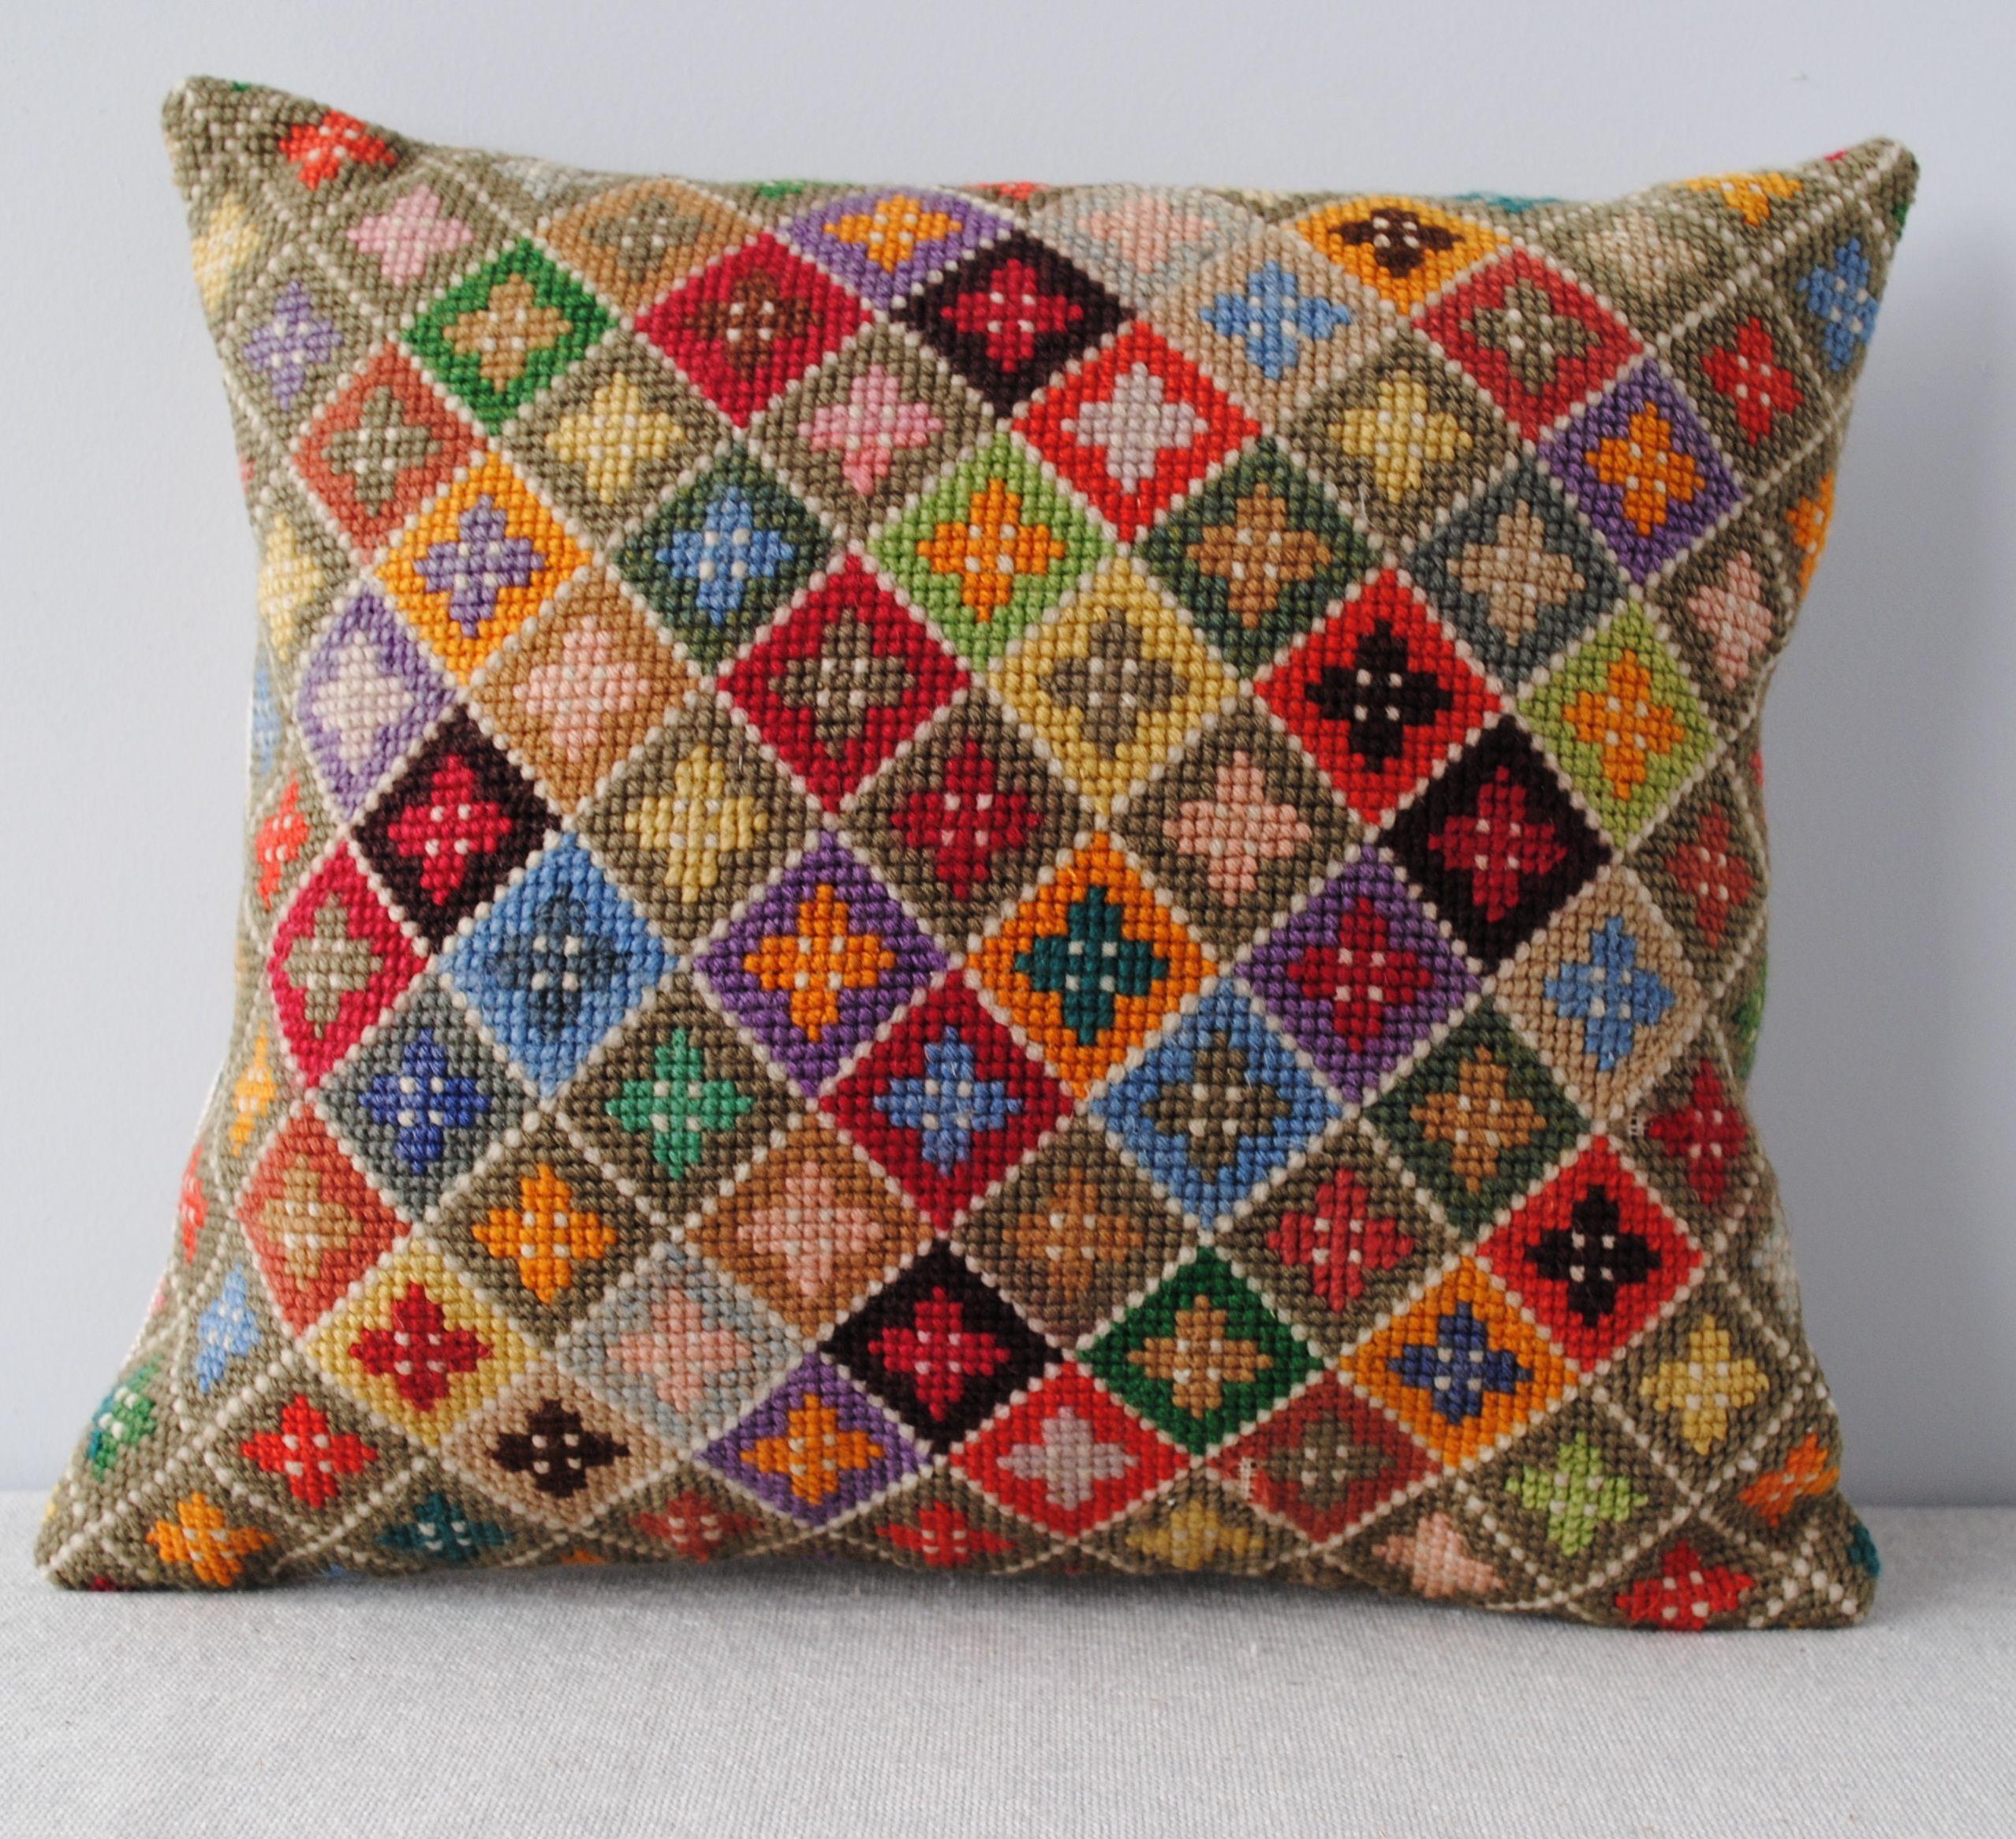 needlepoint cushion/pillow | Beautiful Needlepoint 7 ...